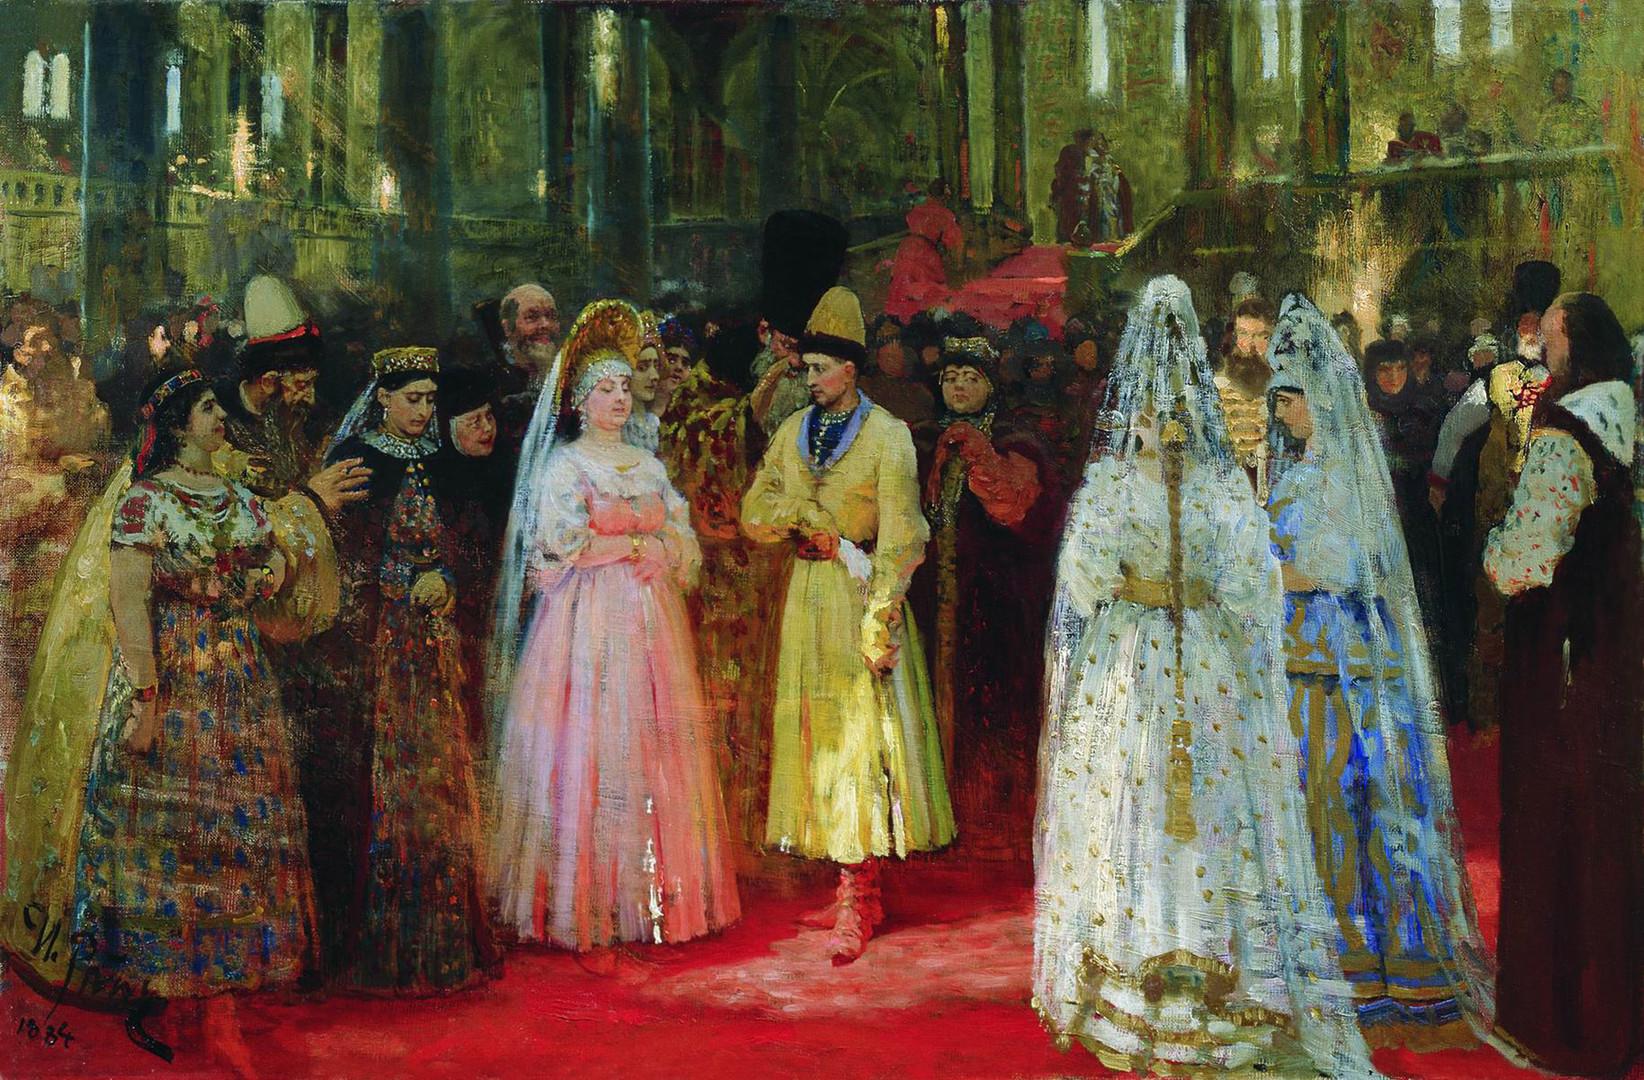 Eligiendo novia para el gran duque, obra de Iván Repin